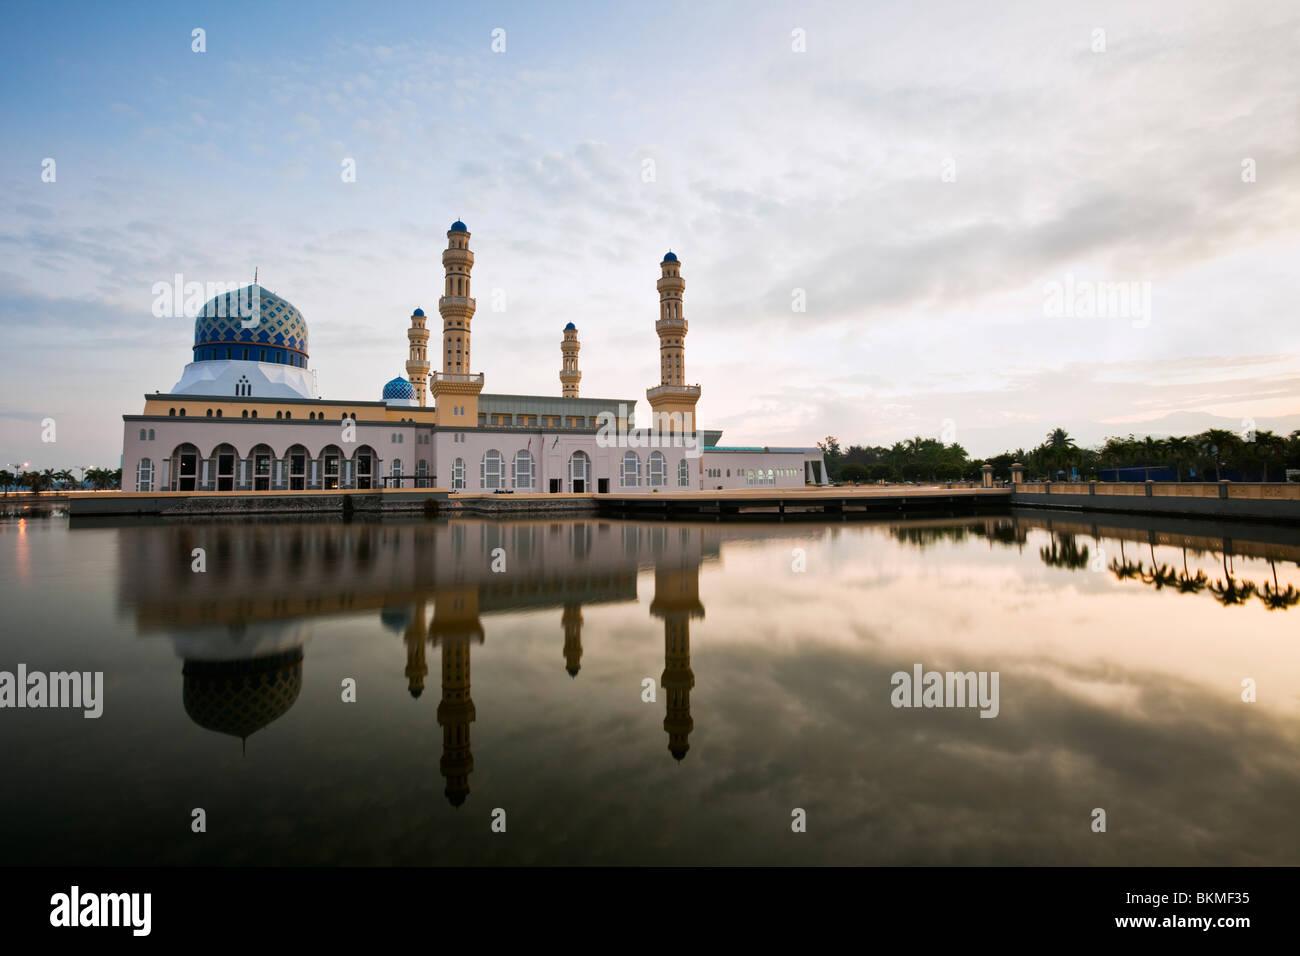 The Kota Kinabalu City Mosque.  Likas Bay, Kota Kinabalu, Sabah, Borneo, Malaysia. - Stock Image